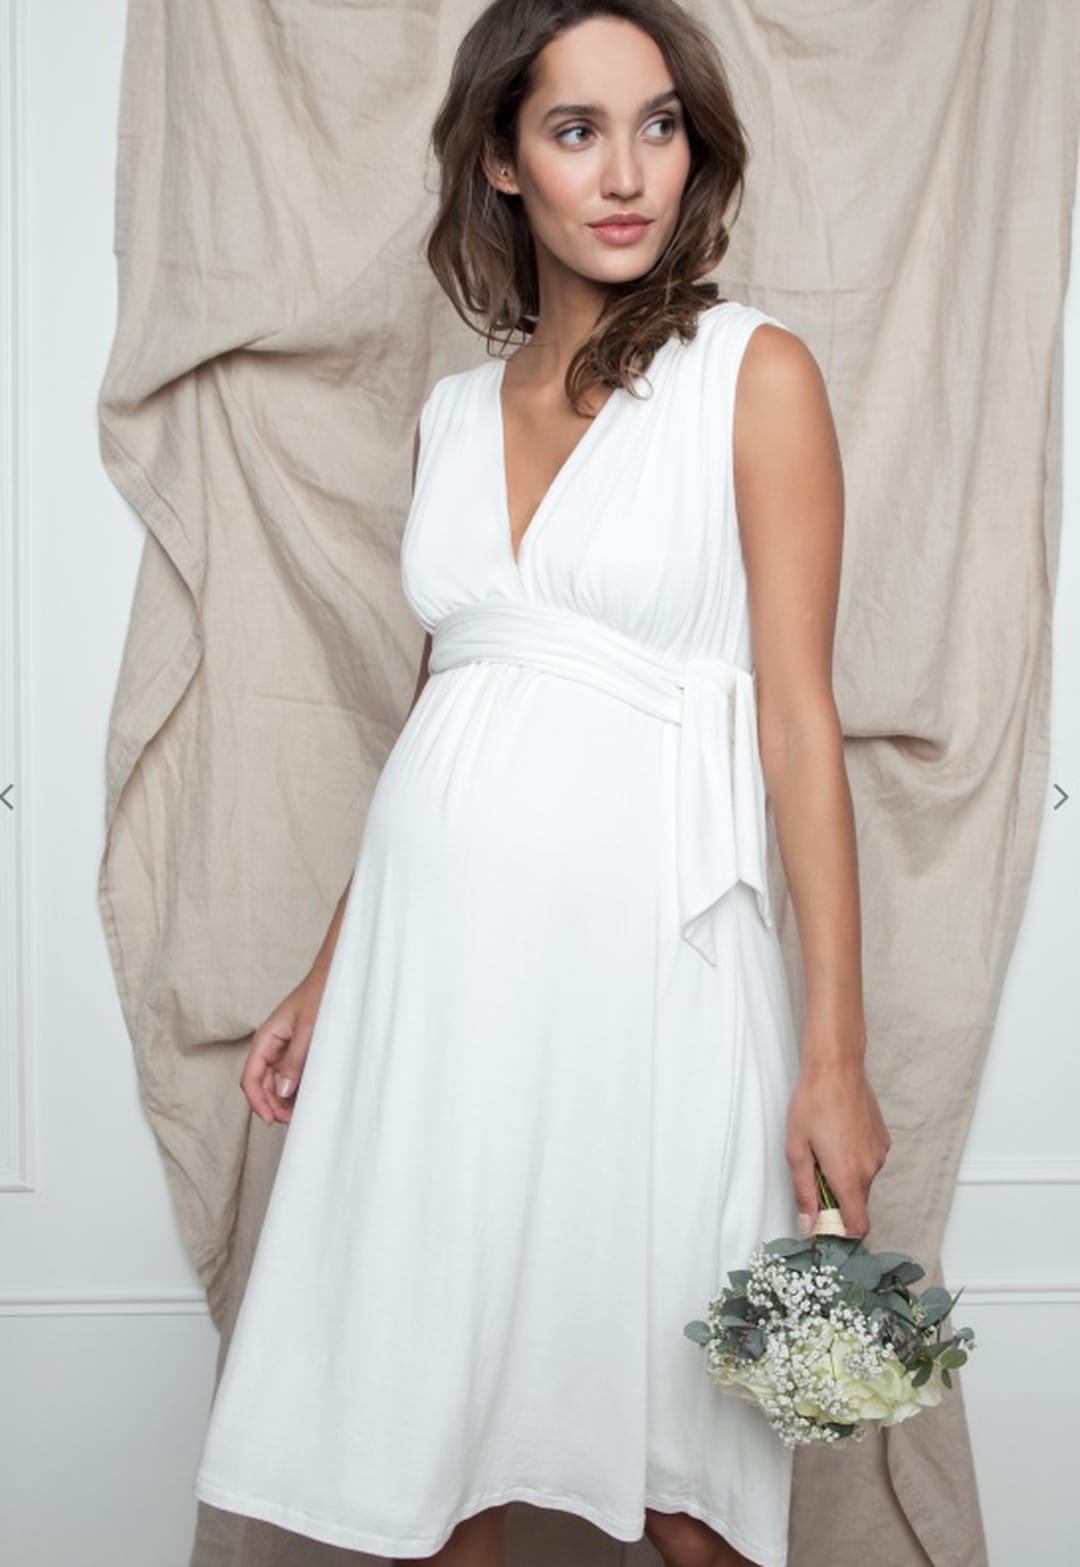 Ou Acheter Sa Robe De Mariee De Grossesse